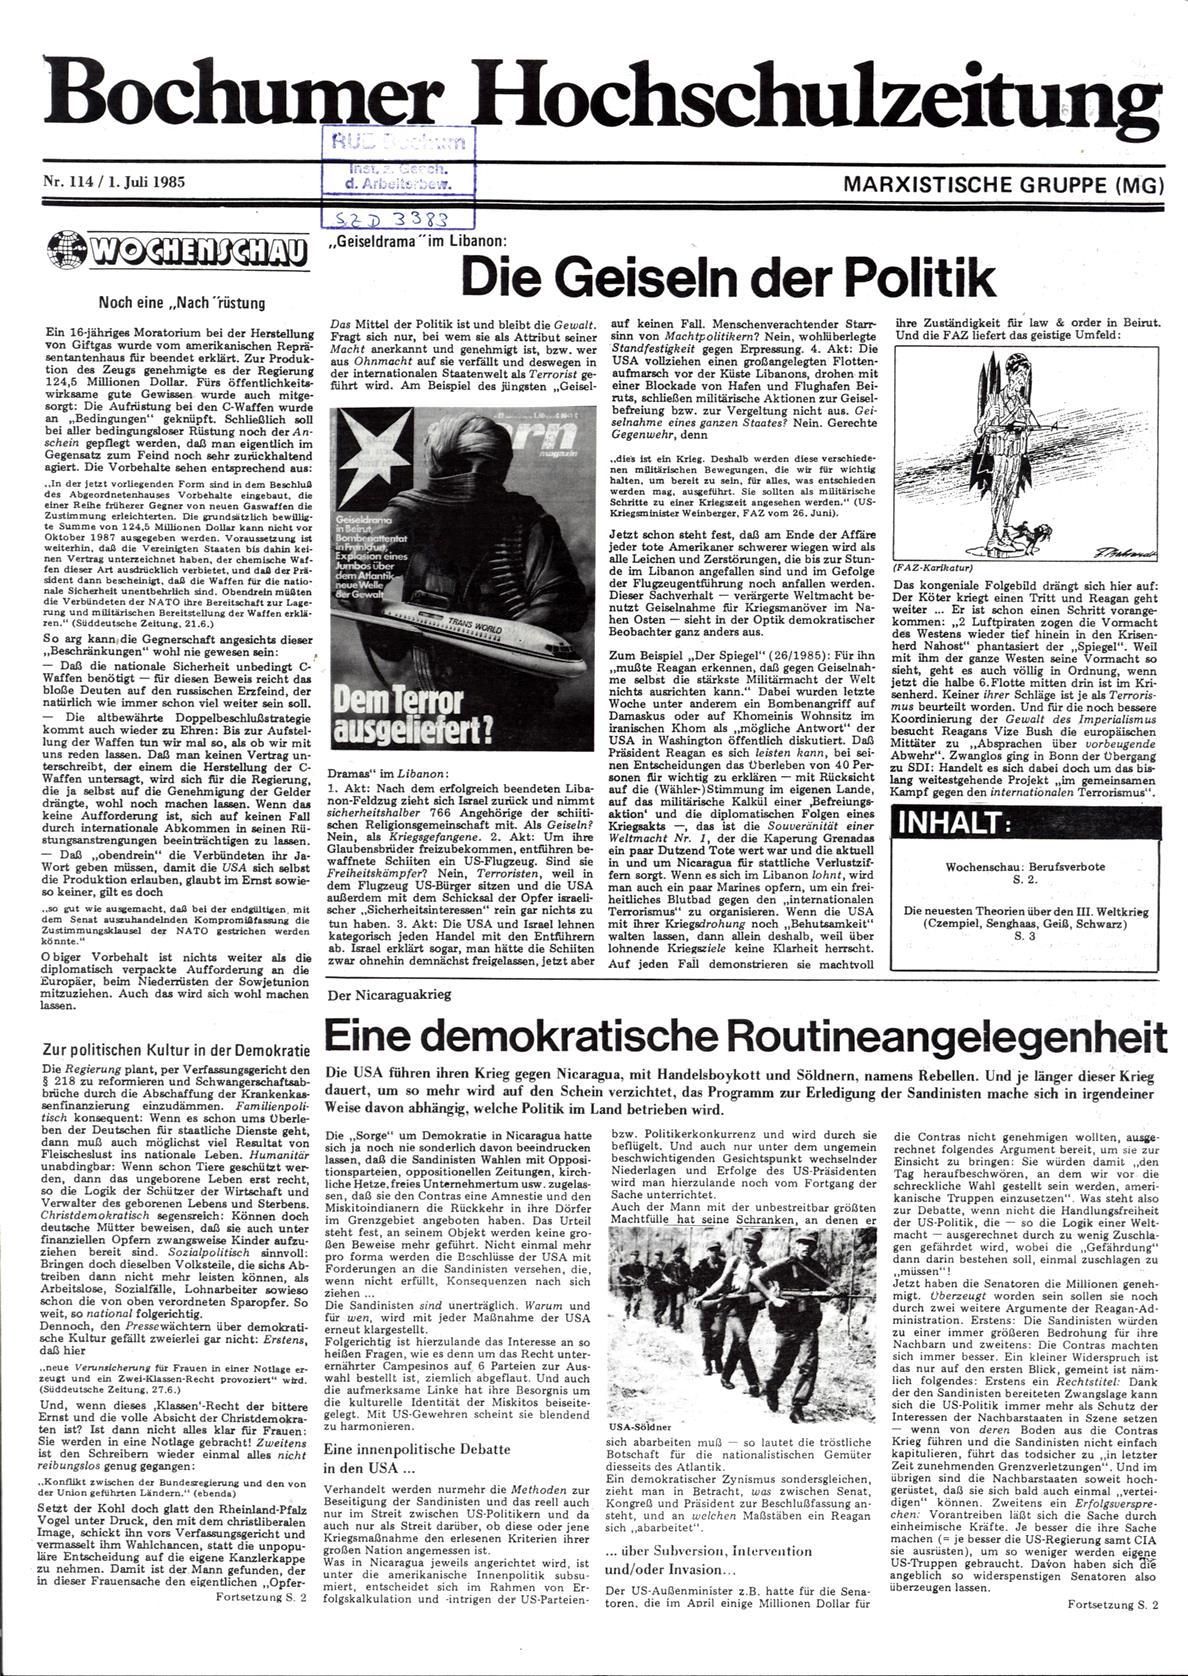 Bochum_BHZ_19850701_114_001